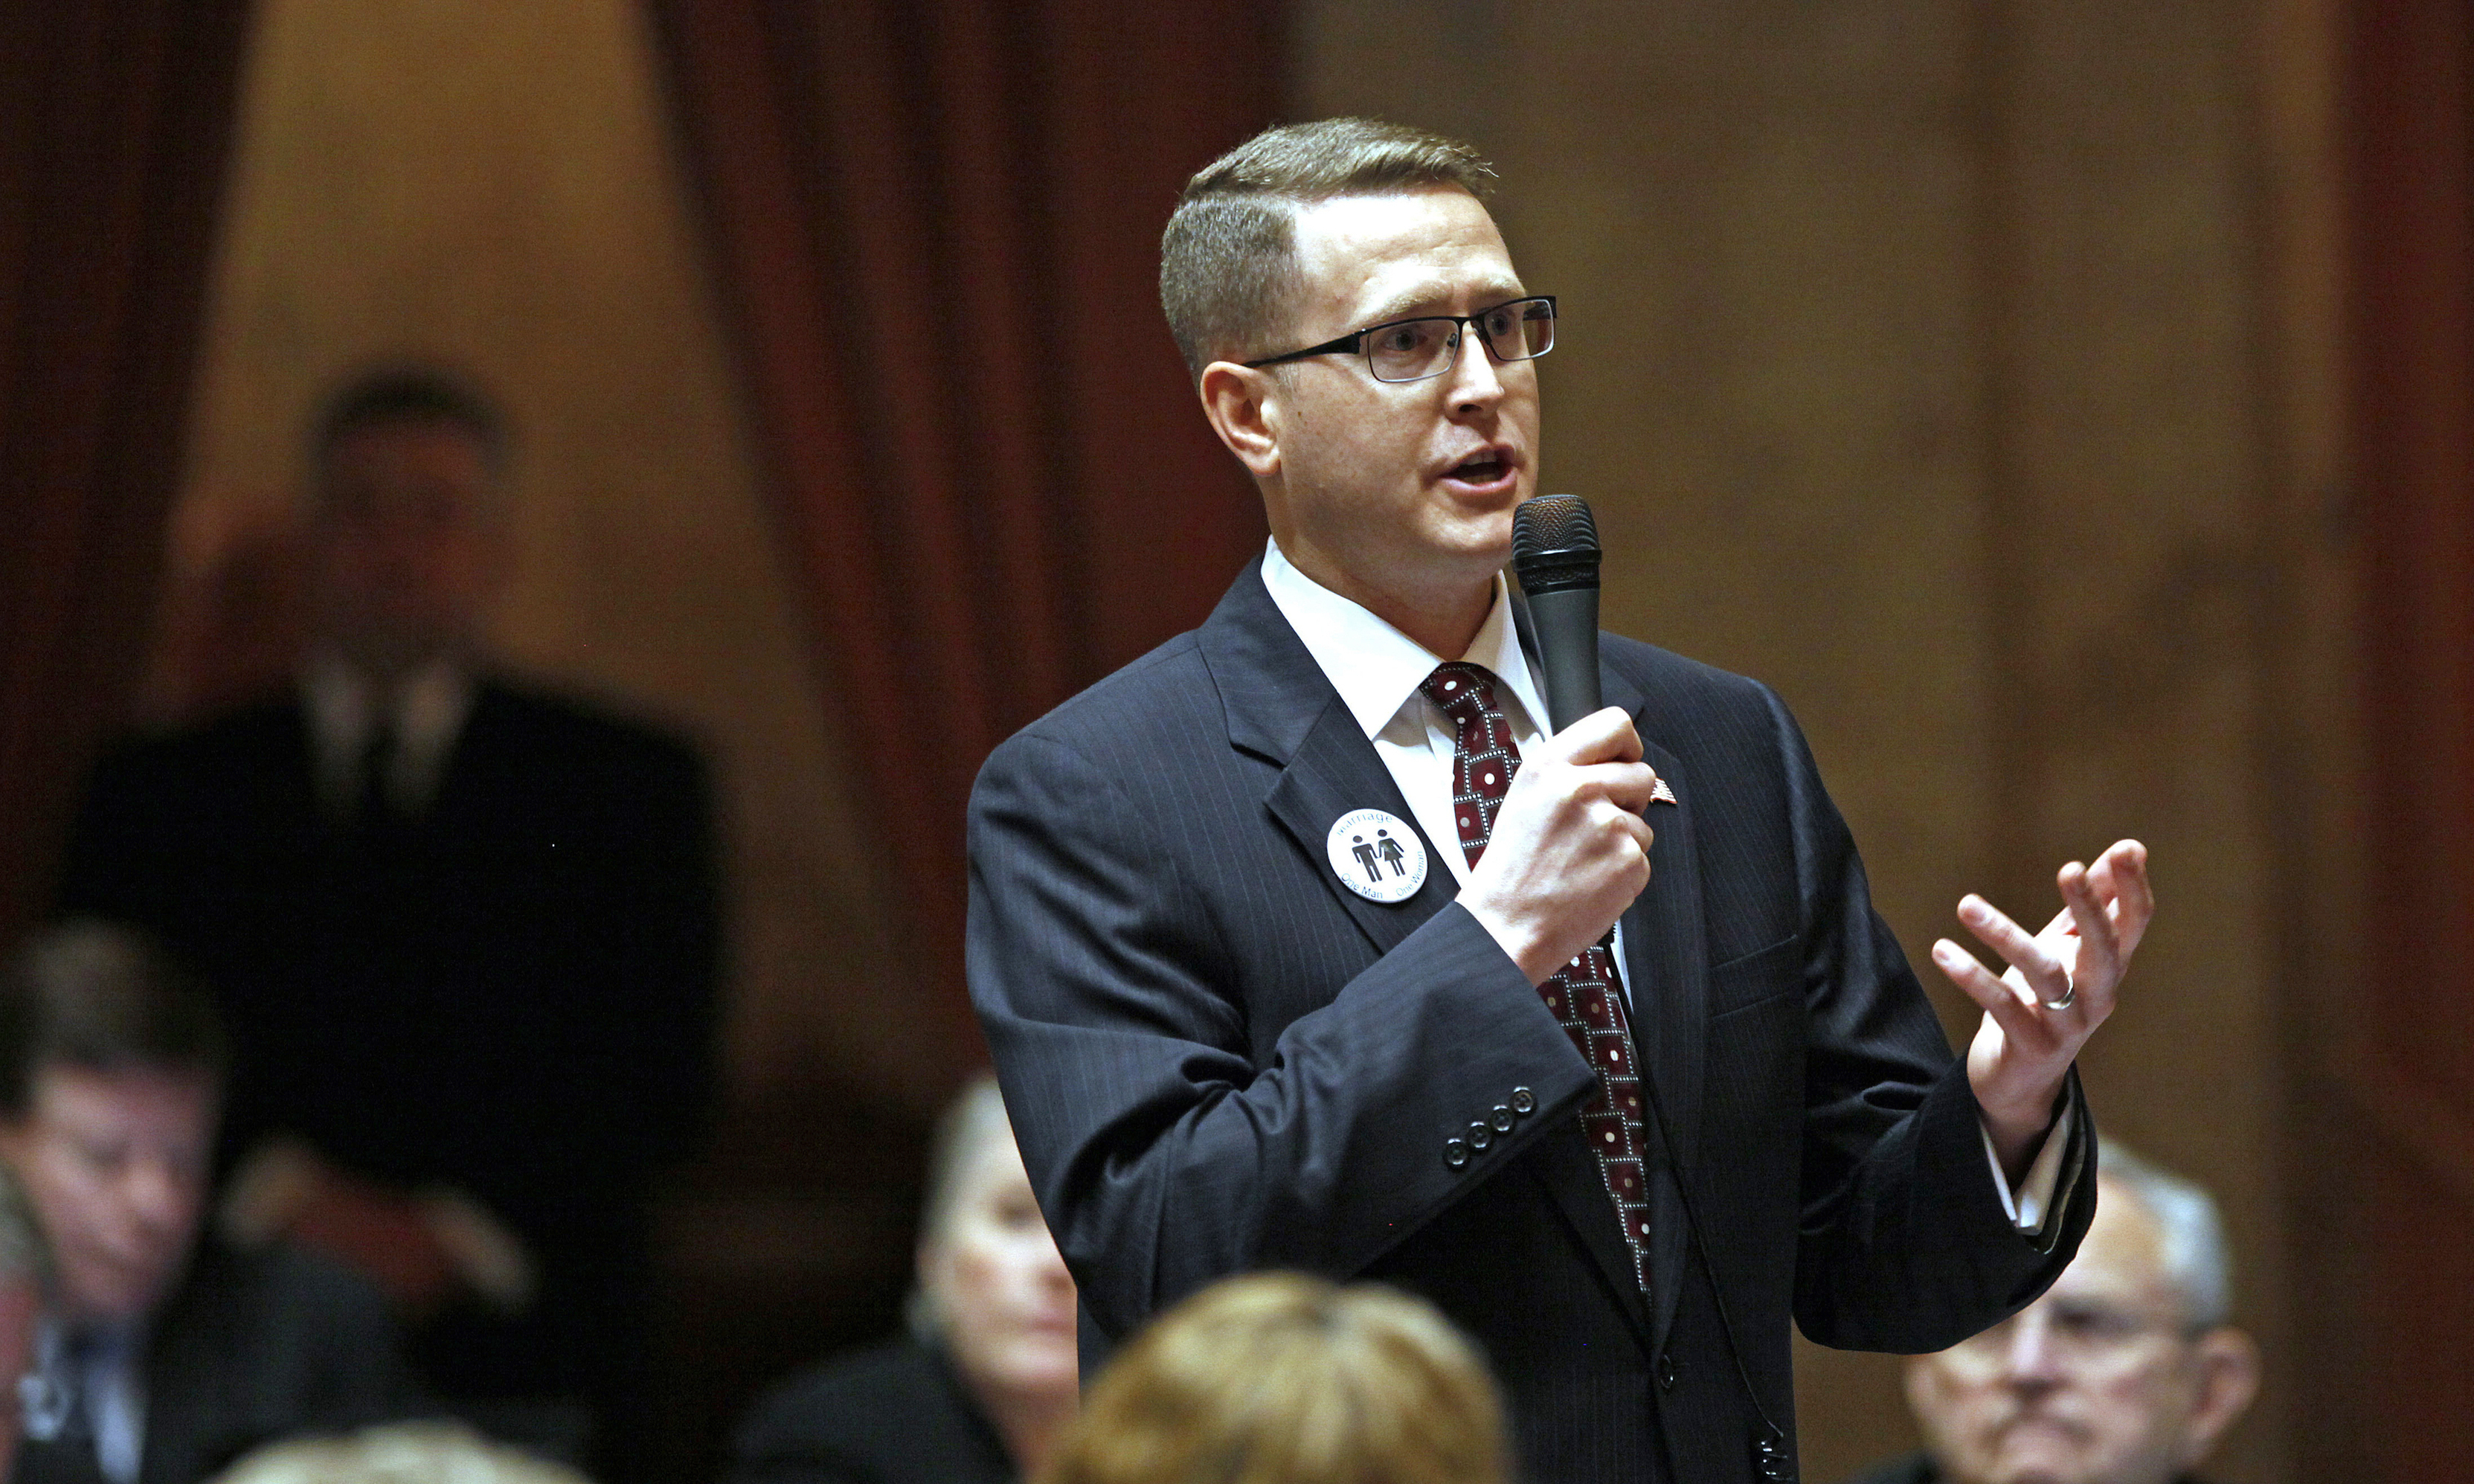 Washington state lawmaker accused of terrorism wont resign